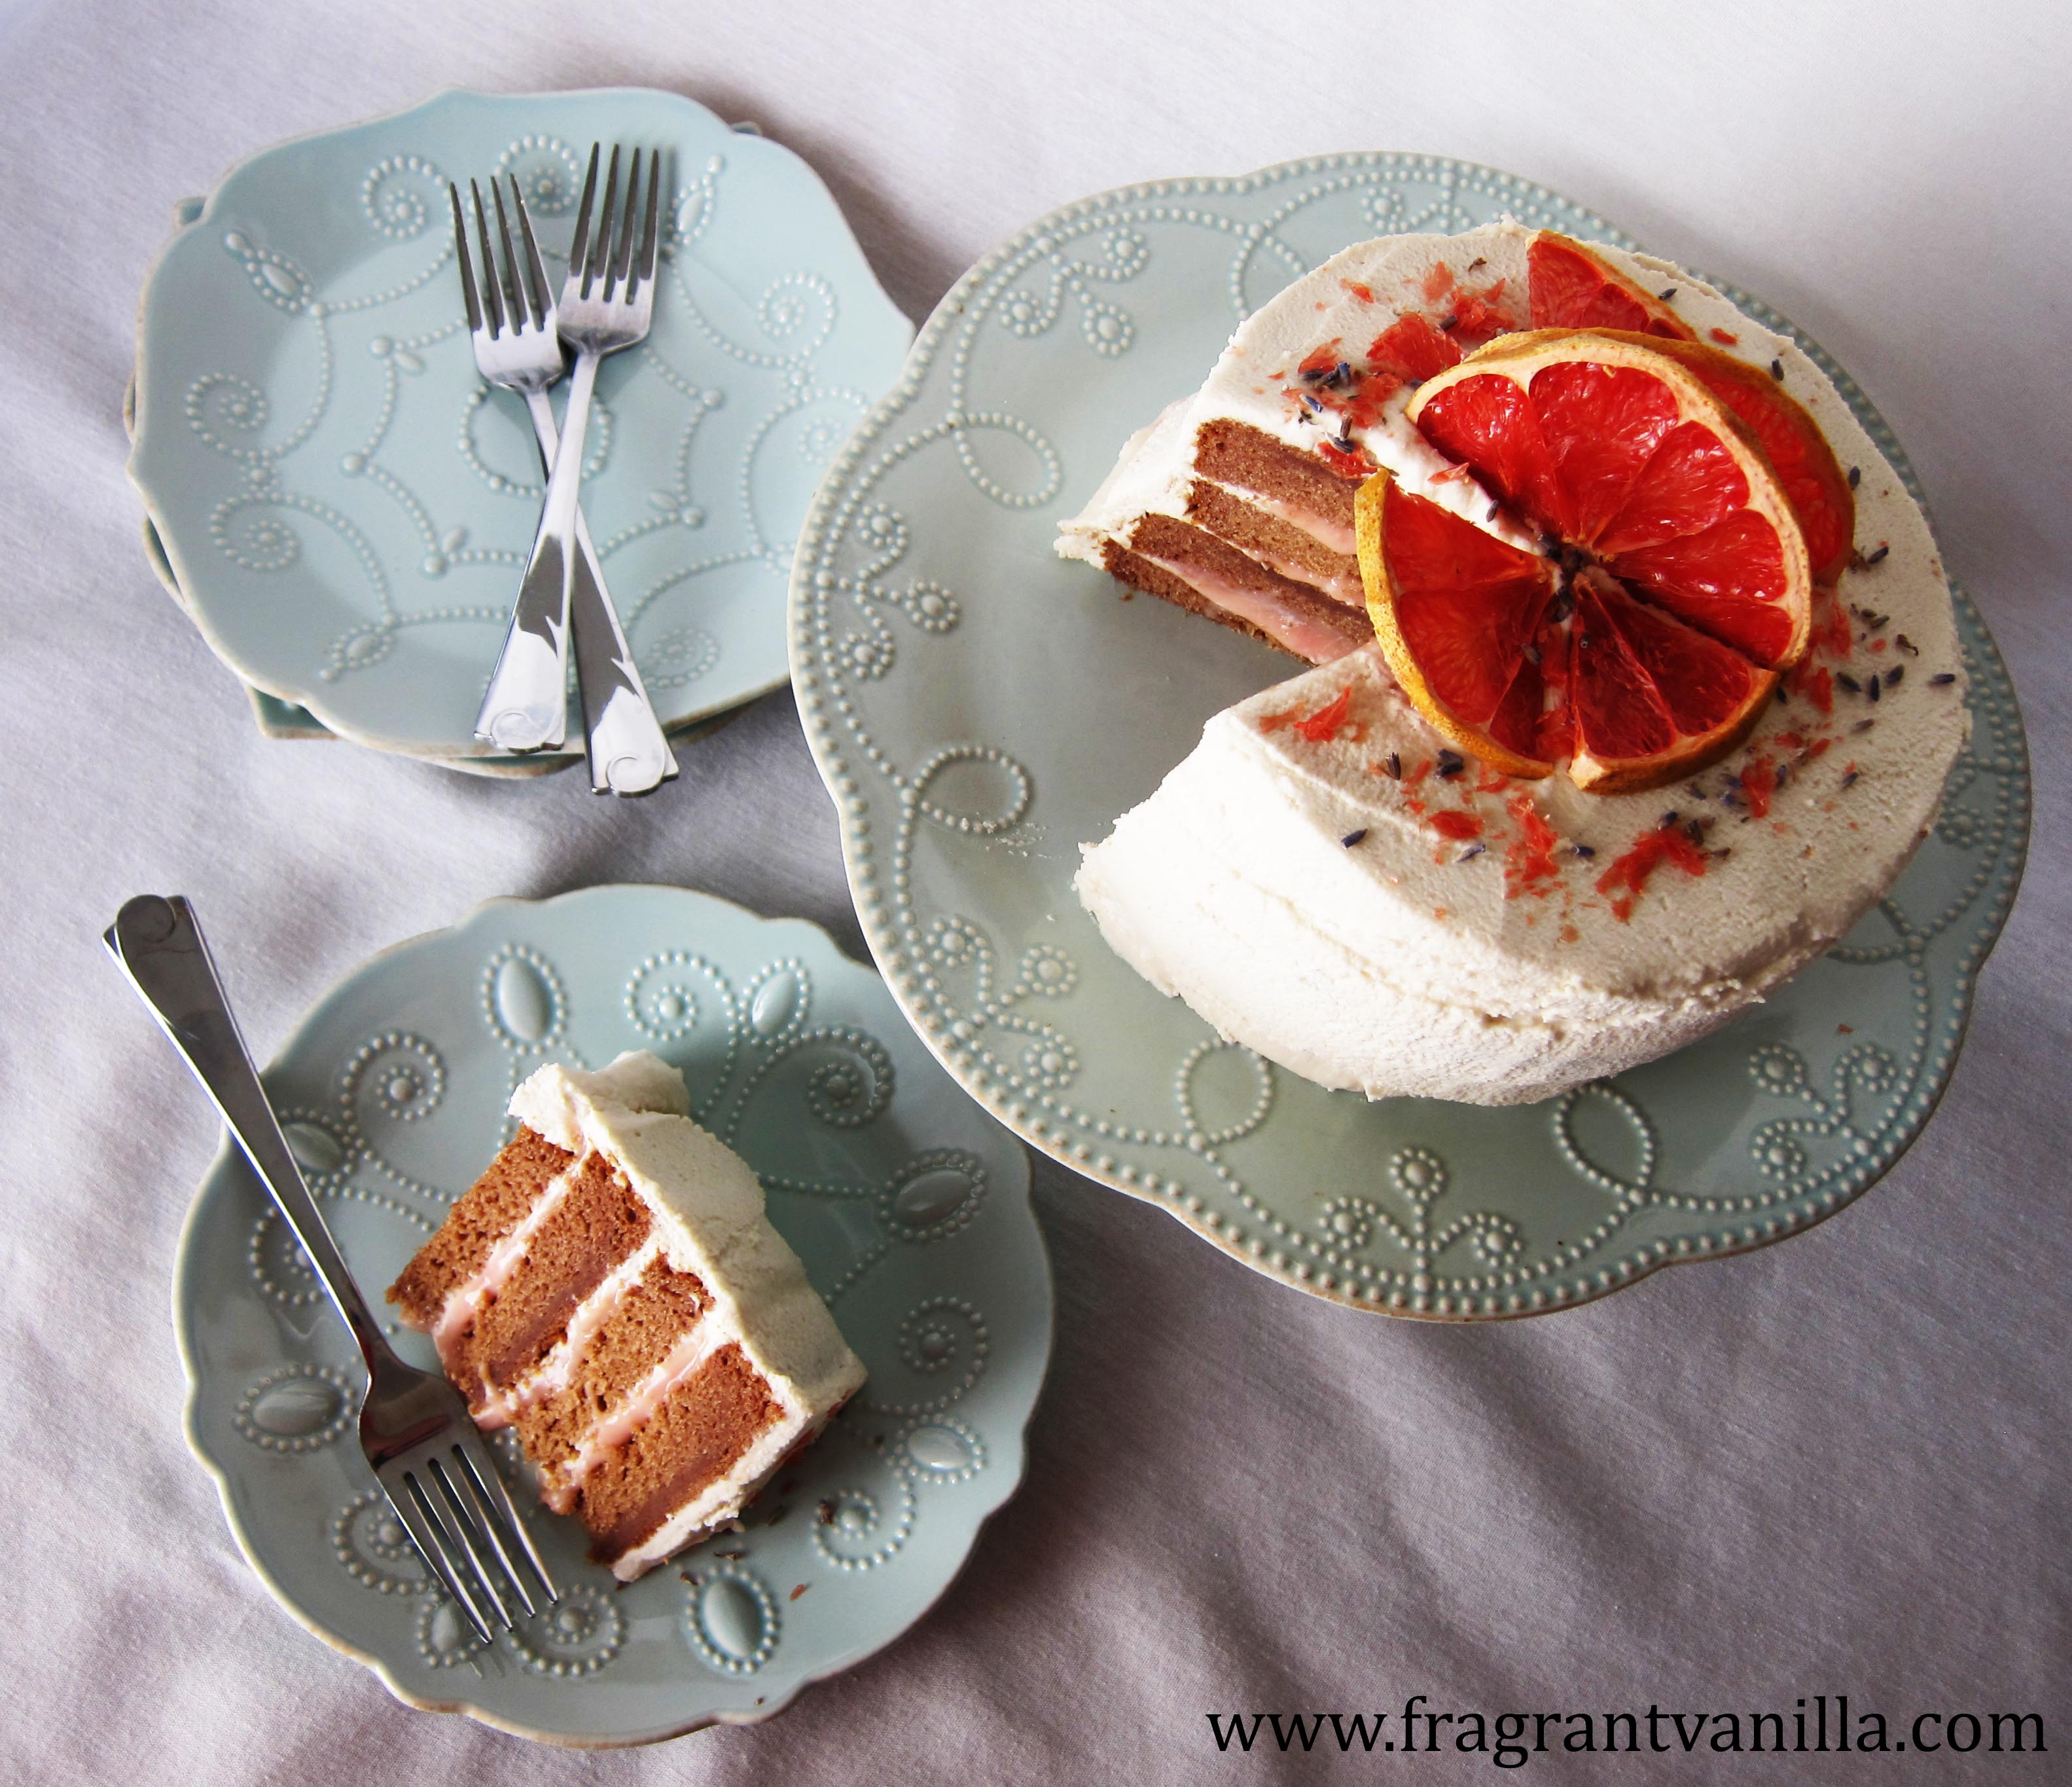 Vegan White Chocolate Grapefruit Cake